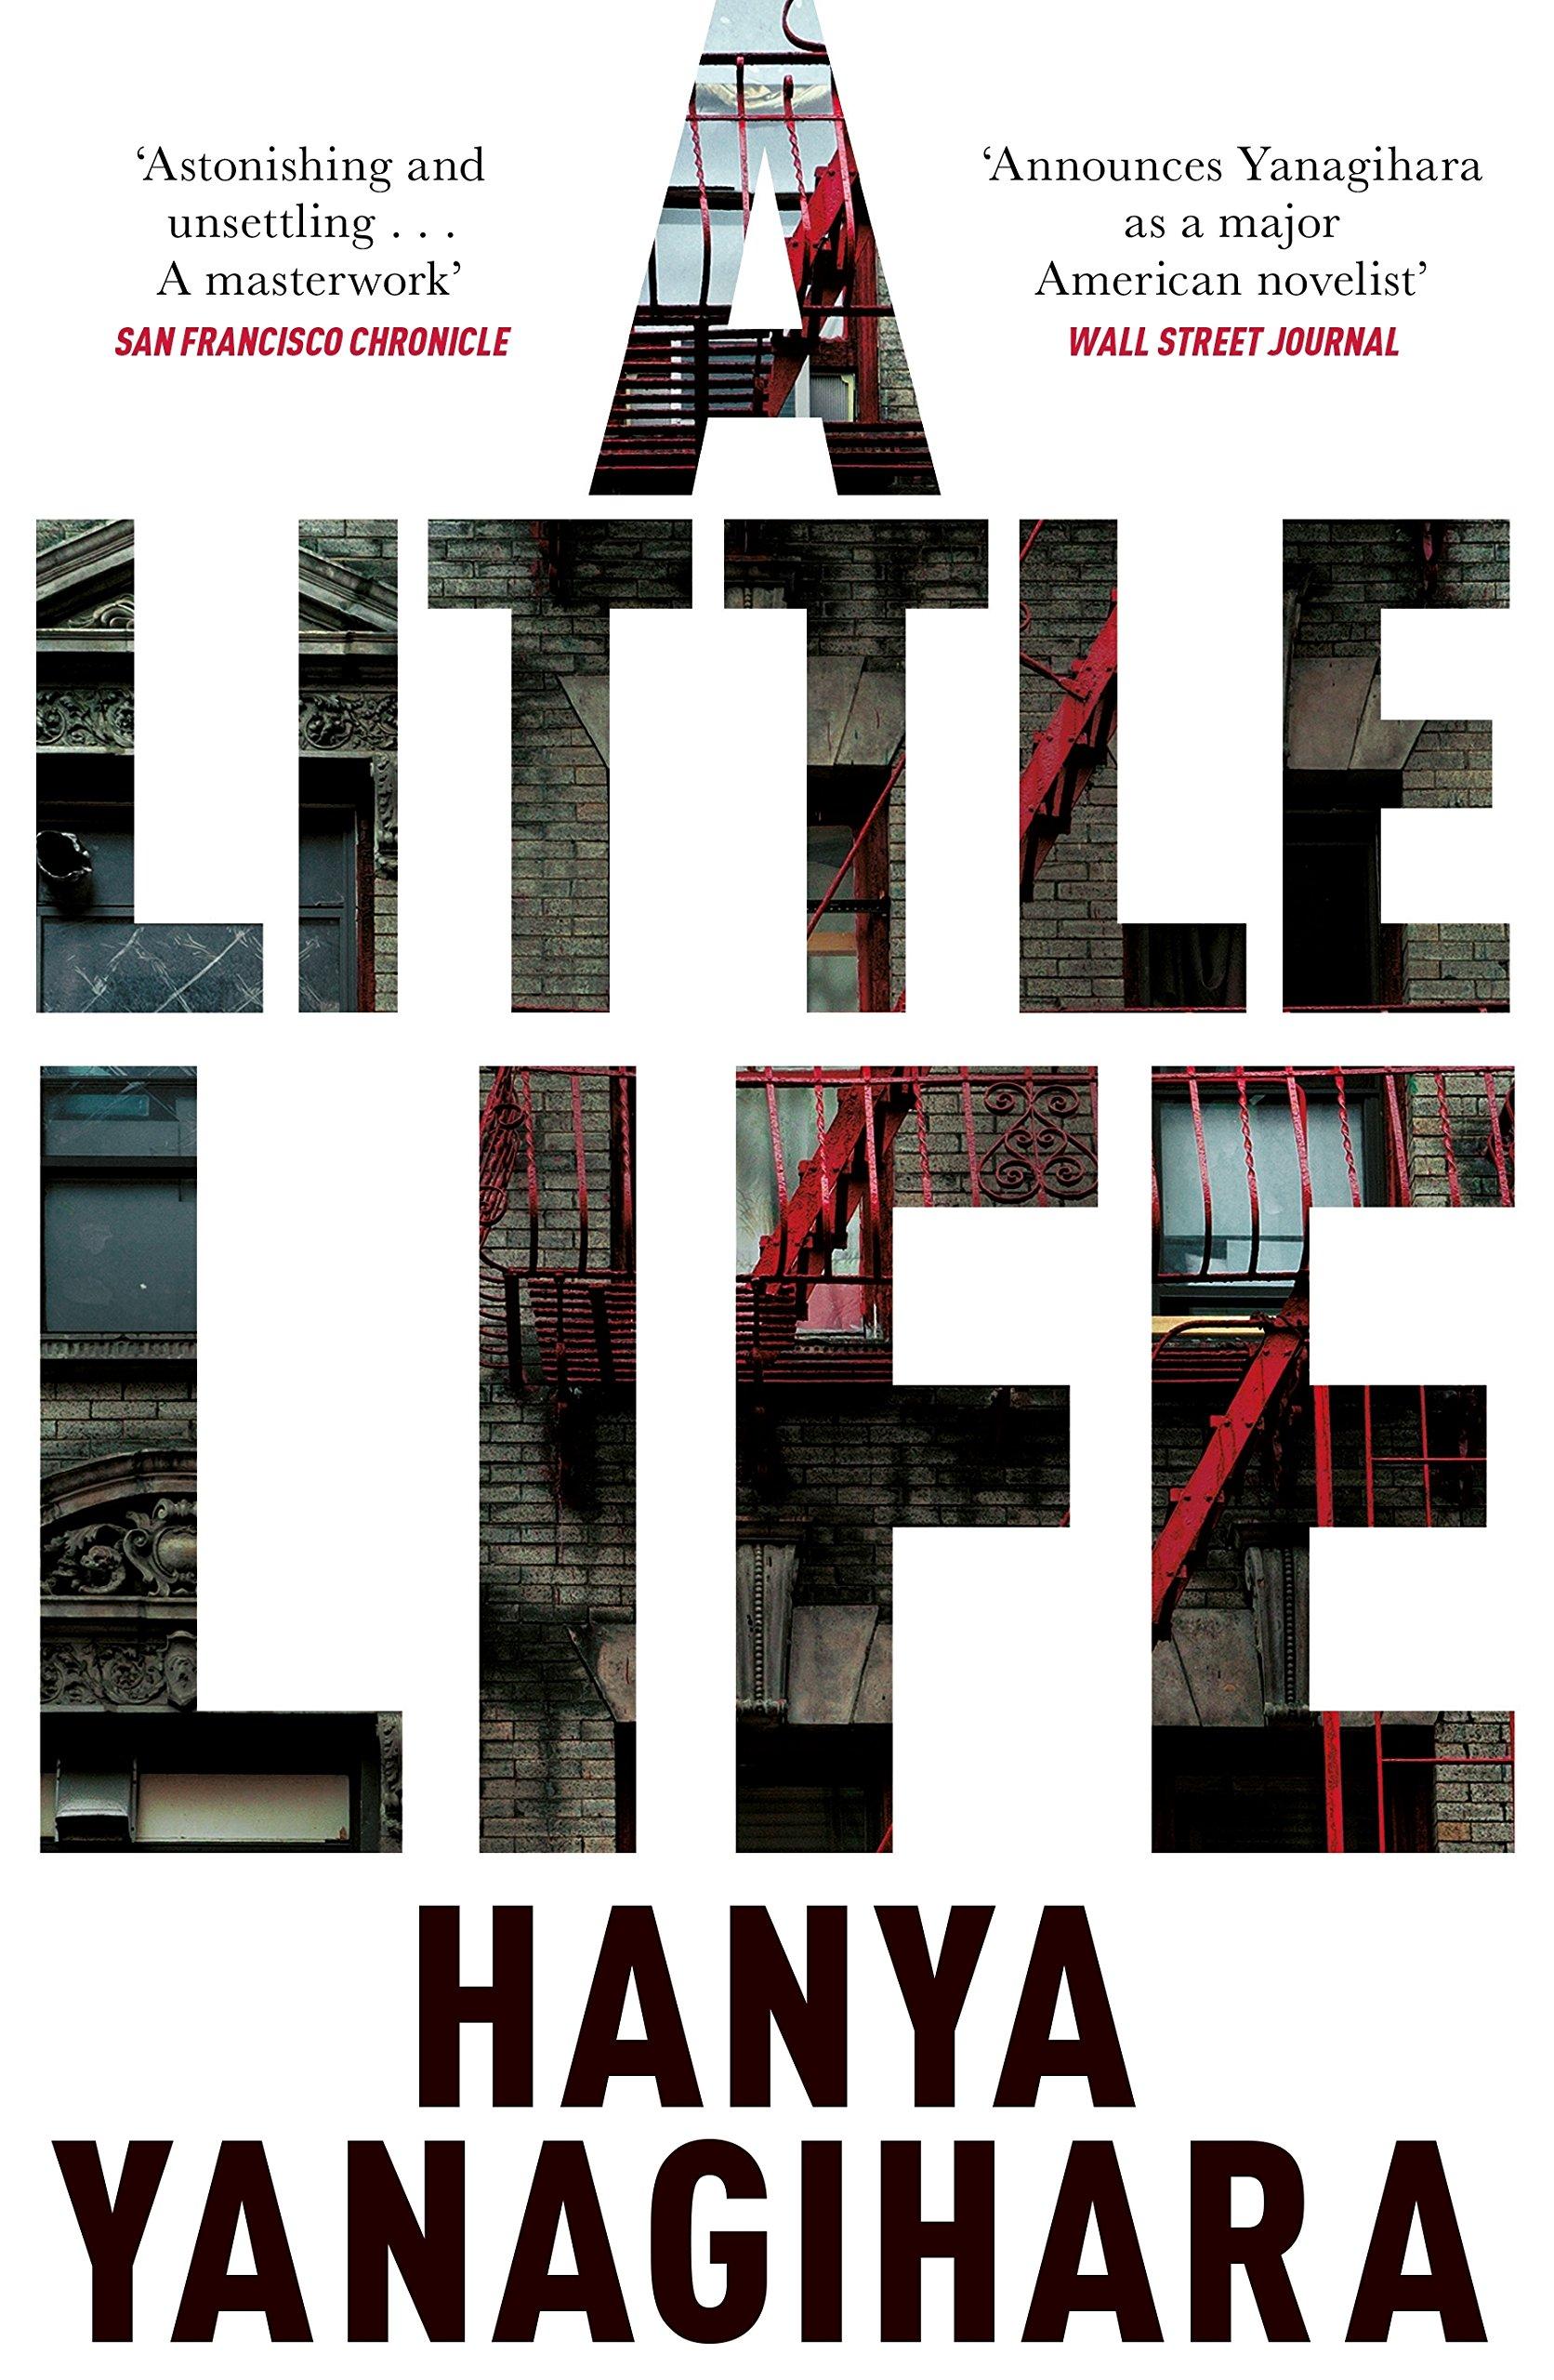 A Little Life: Amazon.co.uk: Yanagihara, Hanya: 9781447294818: Books